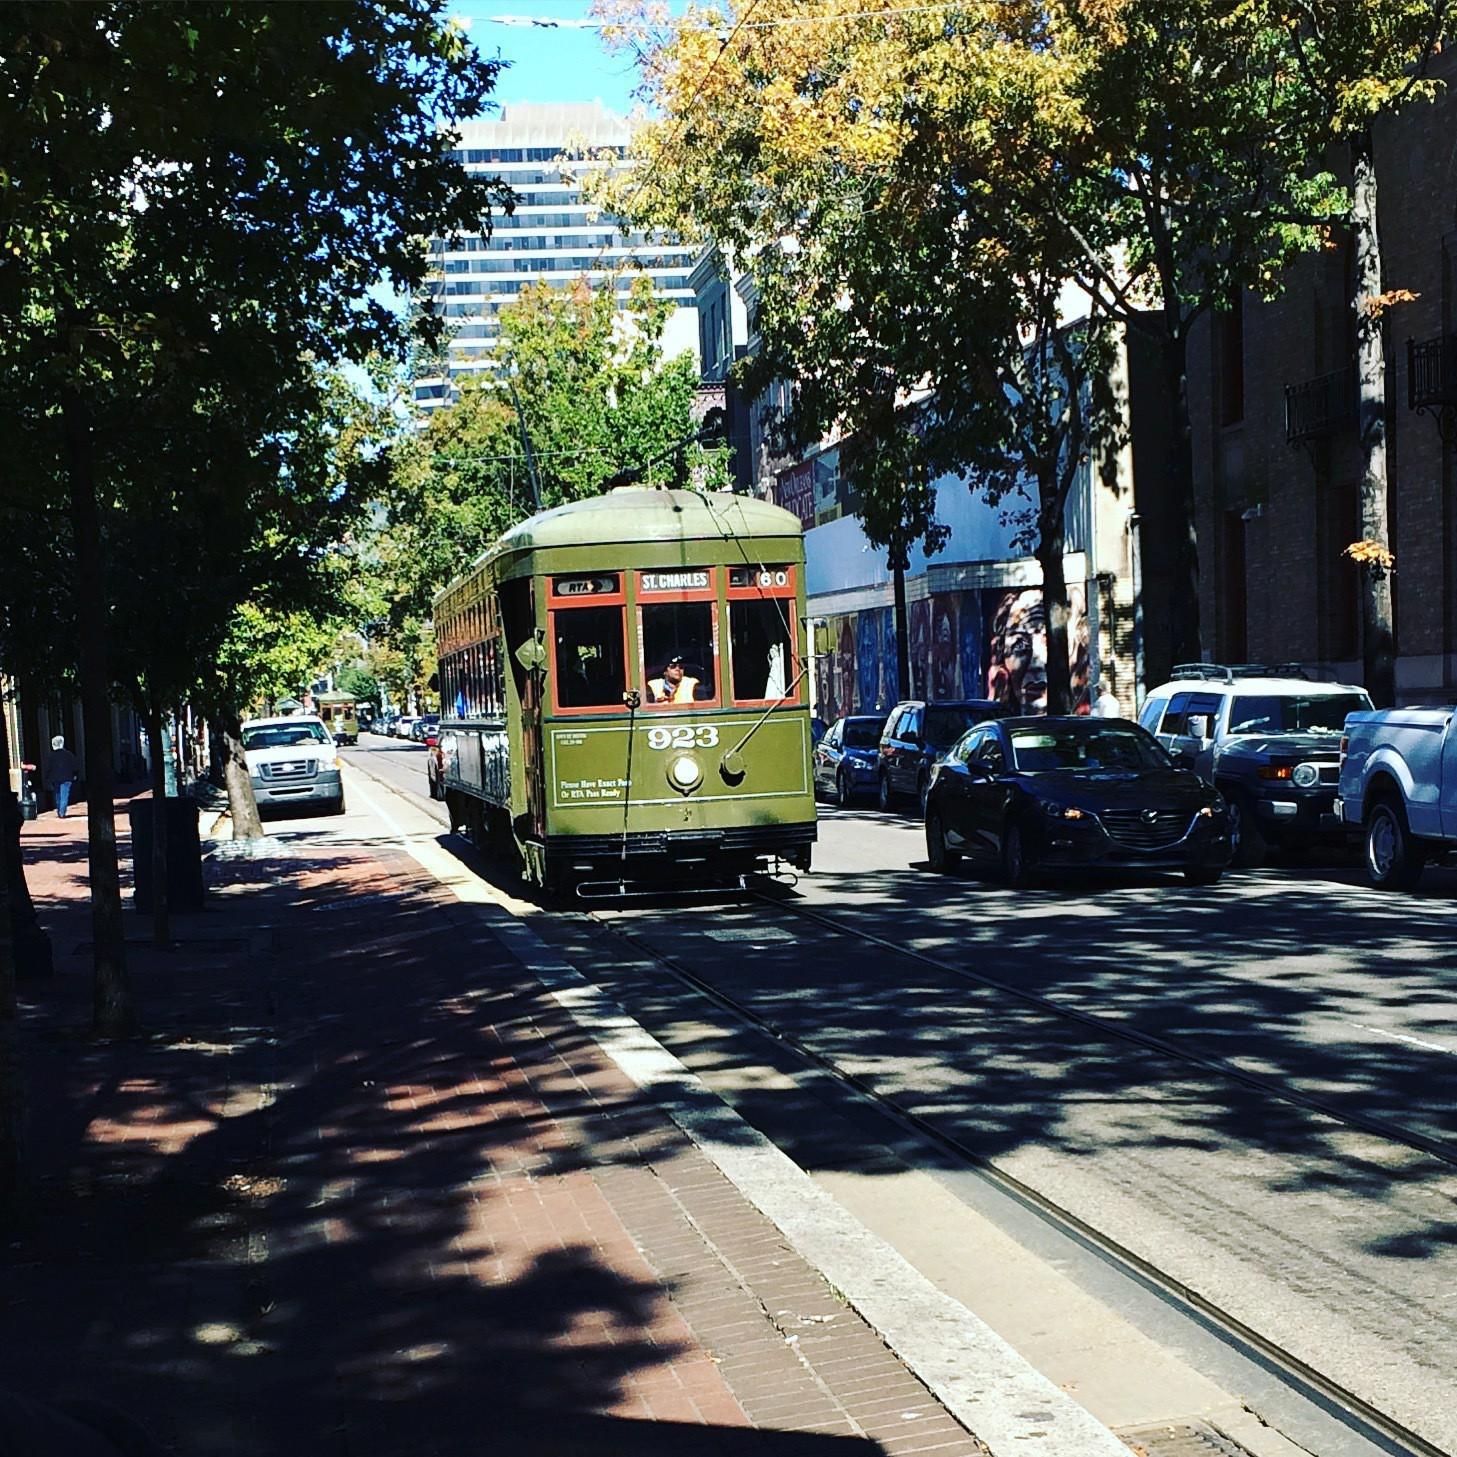 St. Charles Line streetcar